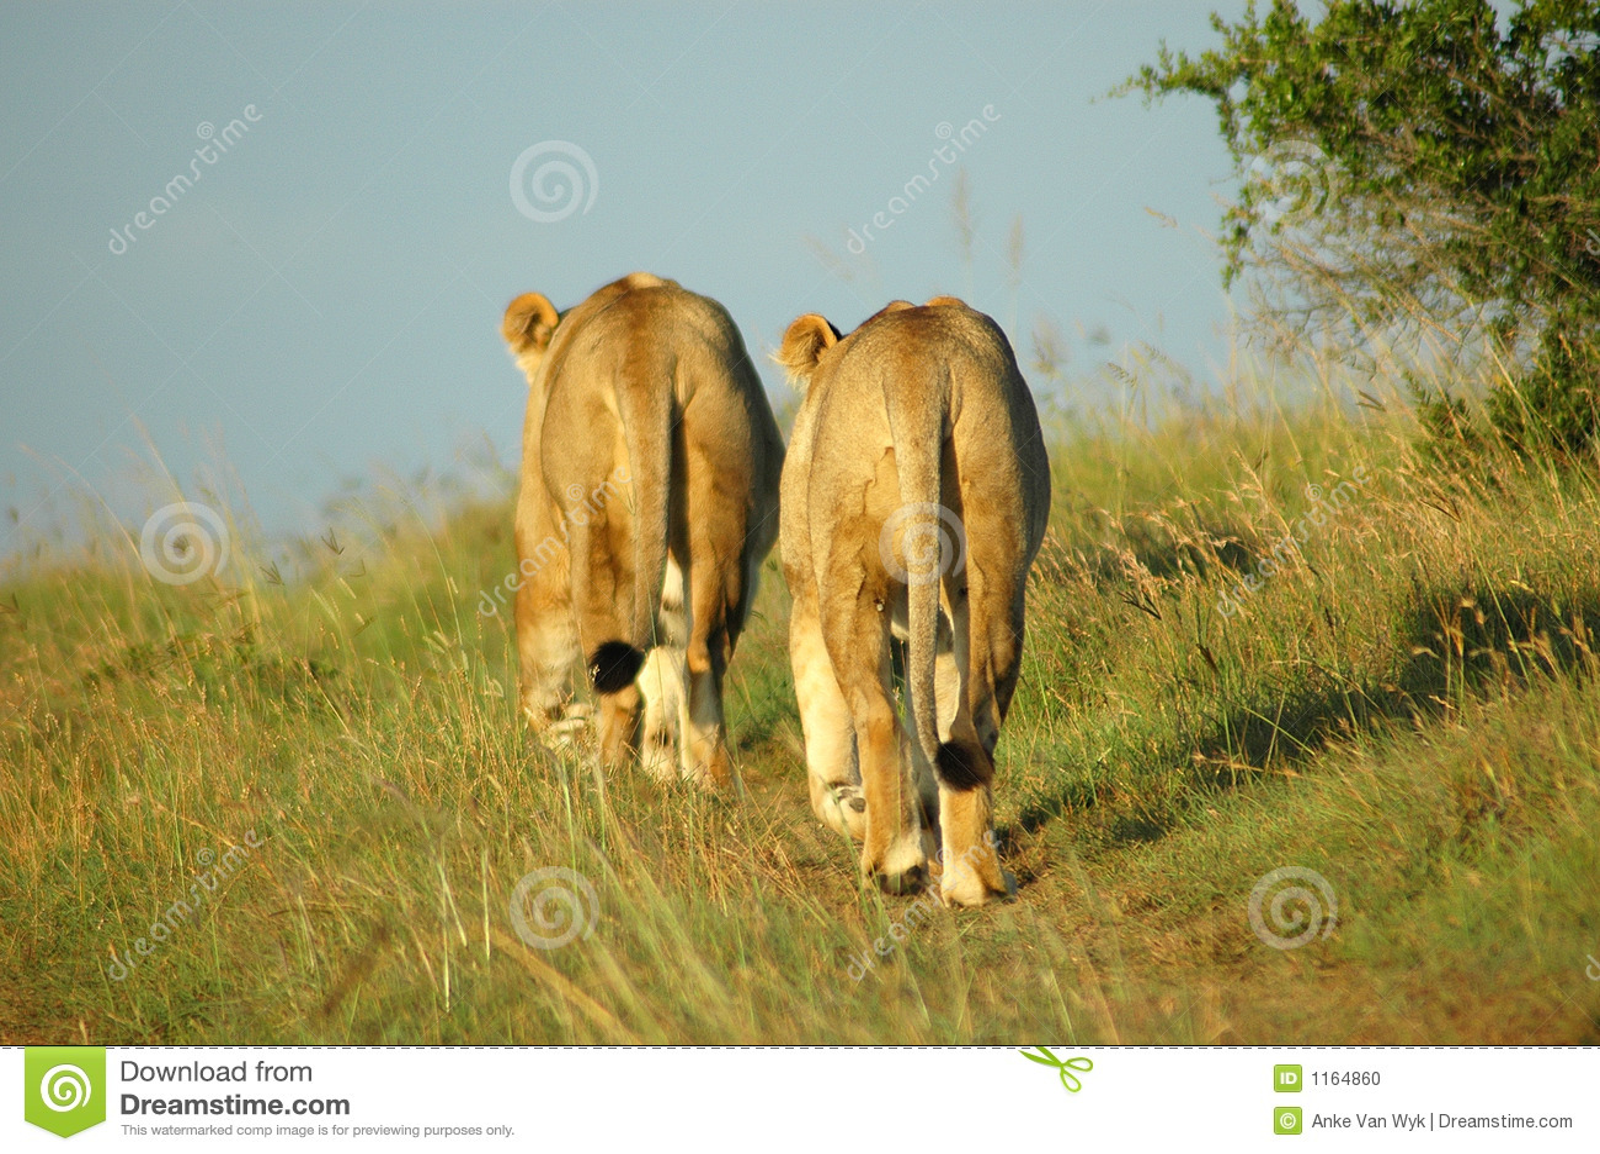 African lions in savanna